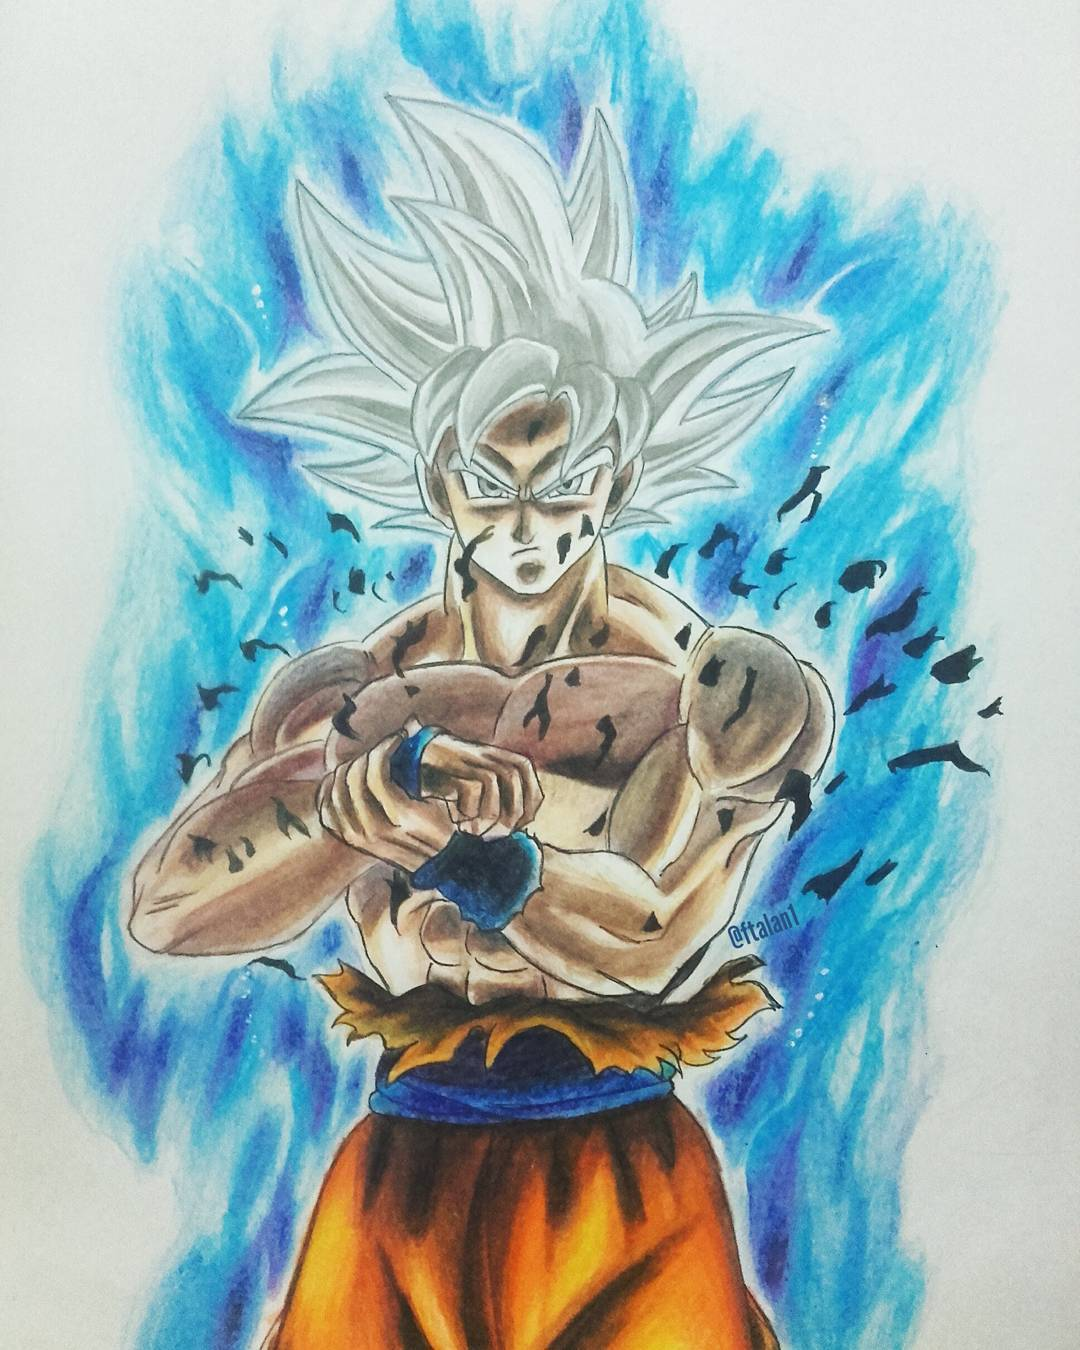 Goku Migatte no Gokui Dominado by alantroche on DeviantArt